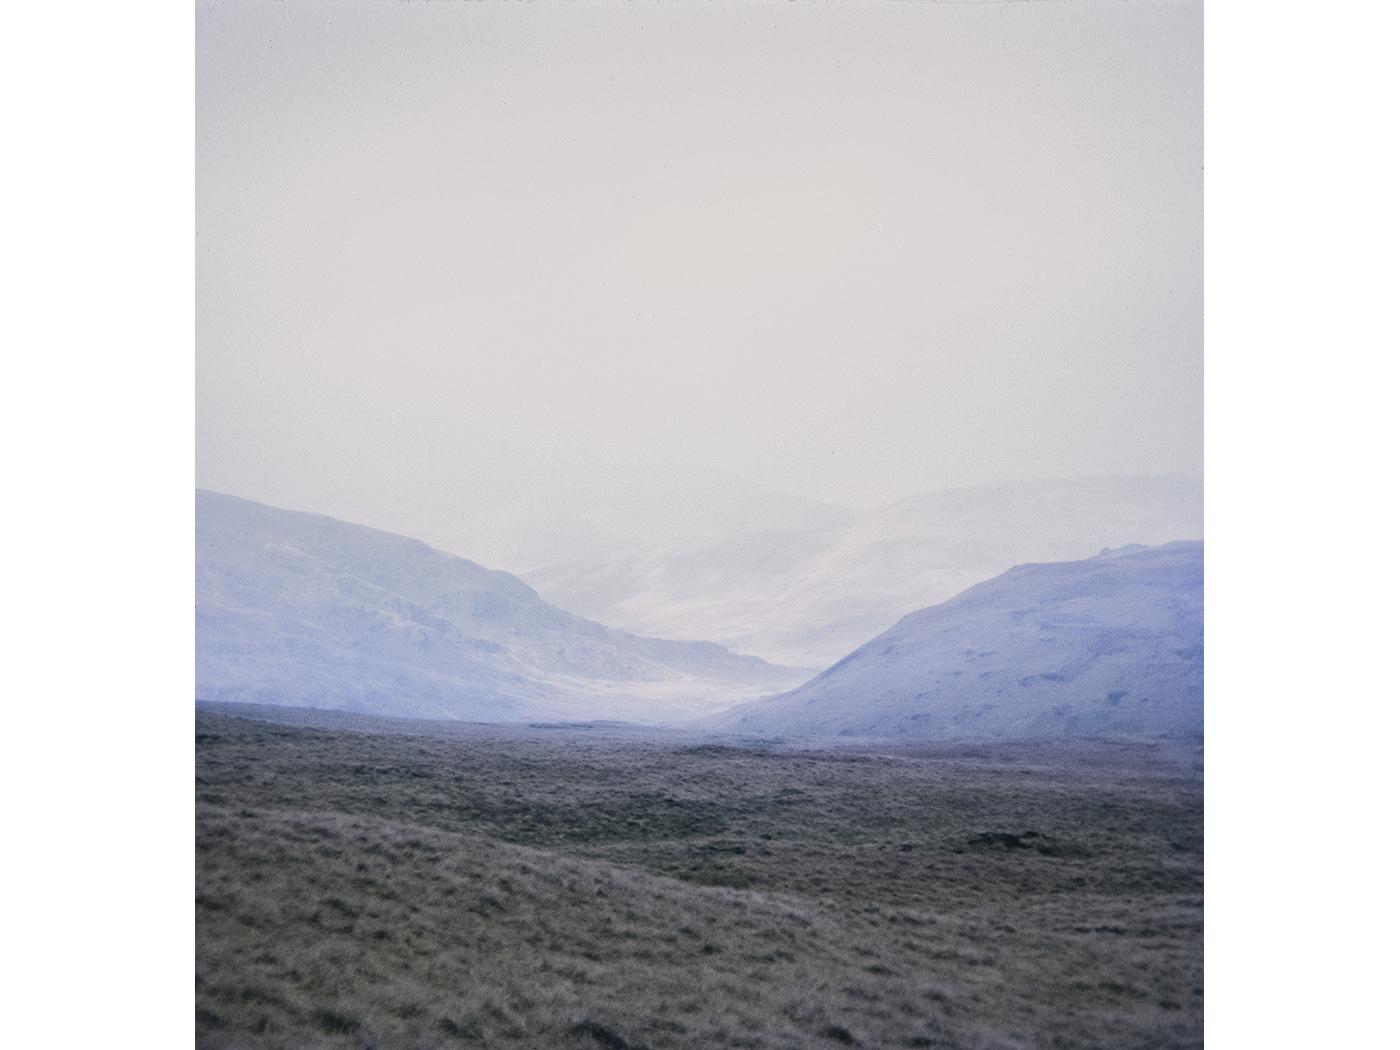 british-boy-scouts-wales-valley.jpg